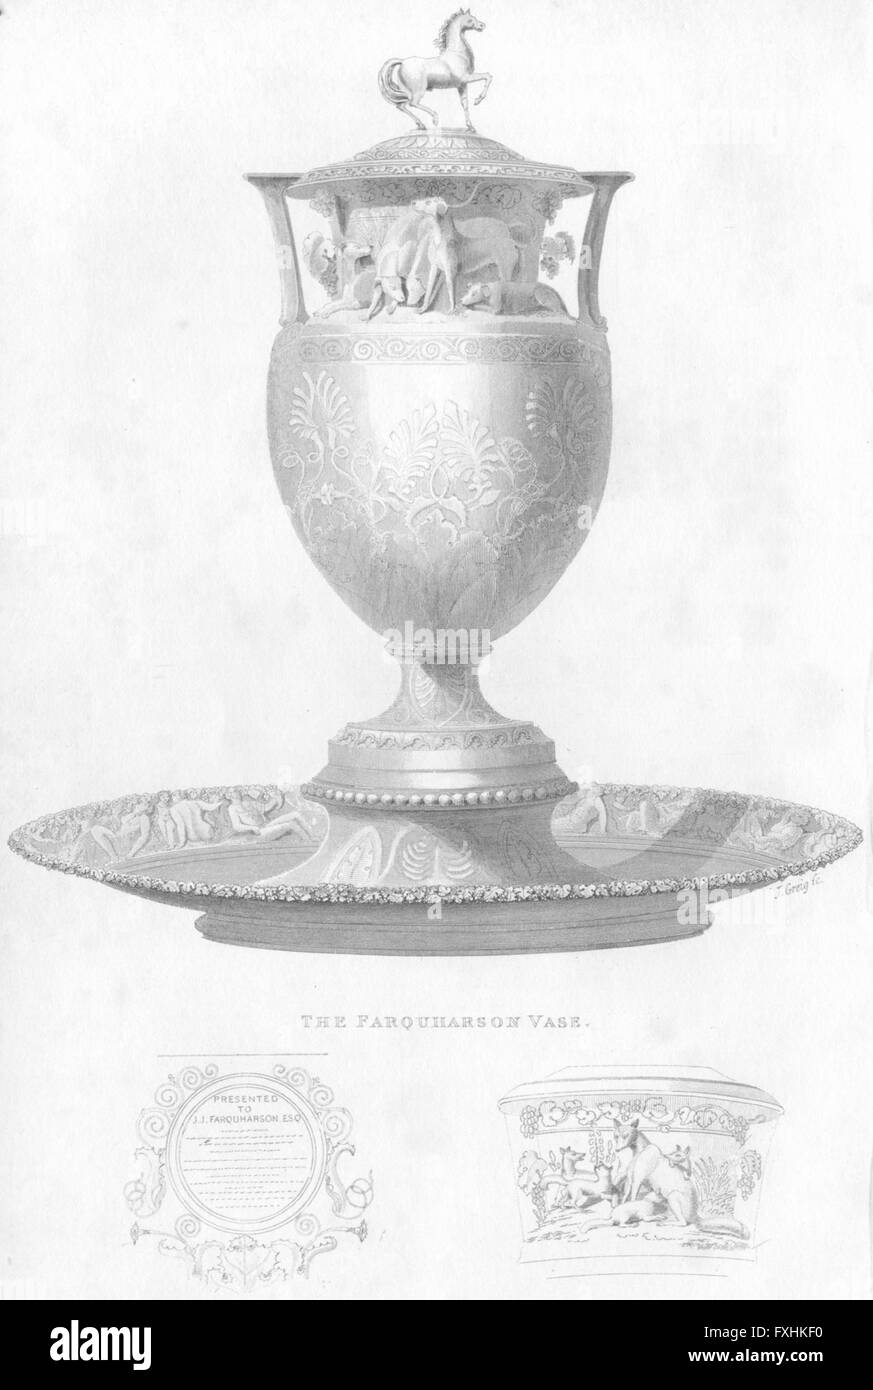 DECORATIVE: The Farquharson Vase, antique print 1834 - Stock Image